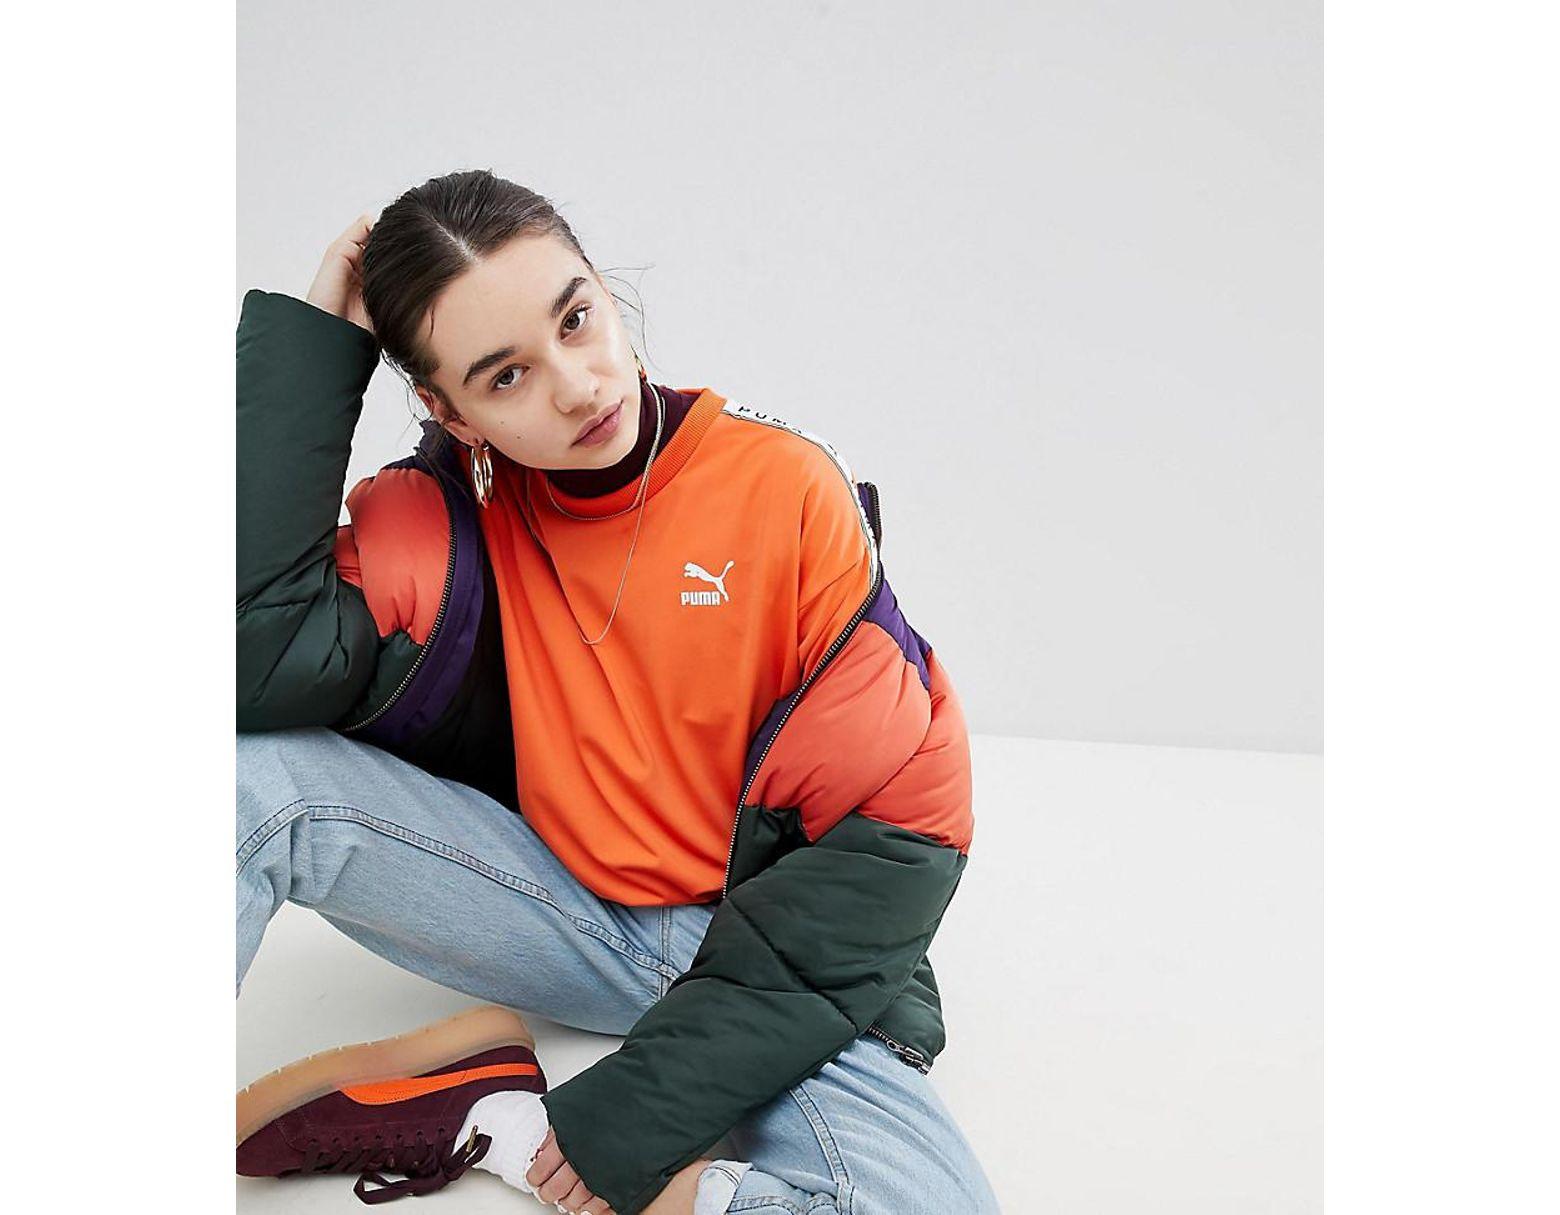 078d8cf3cbd PUMA Exclusive To Asos Sweatshirt With Taped Side Stripe In Orange in  Orange - Lyst